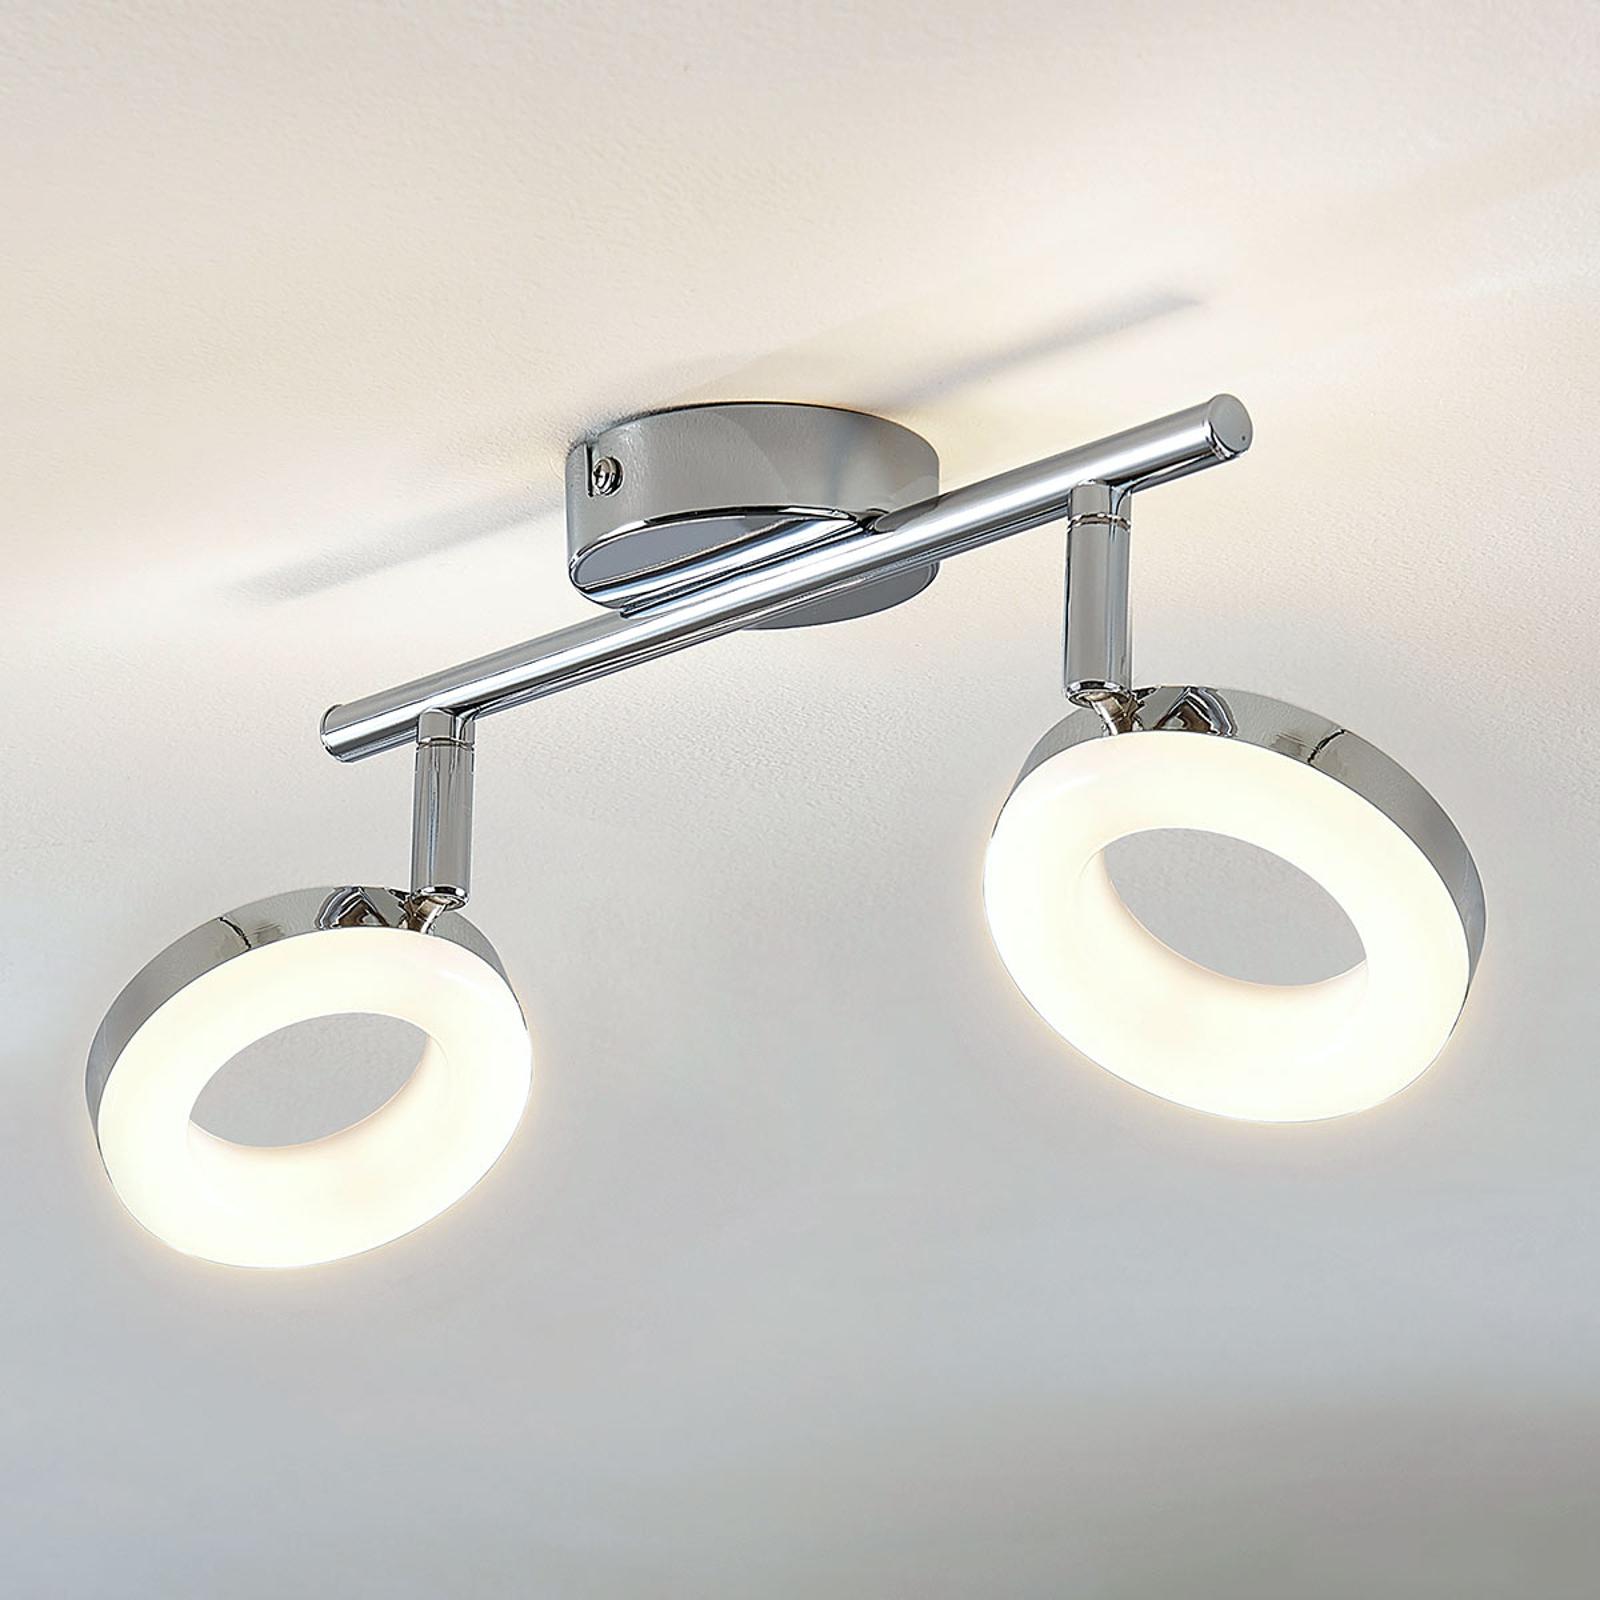 LED plafondlamp Ringo, 2-lamps